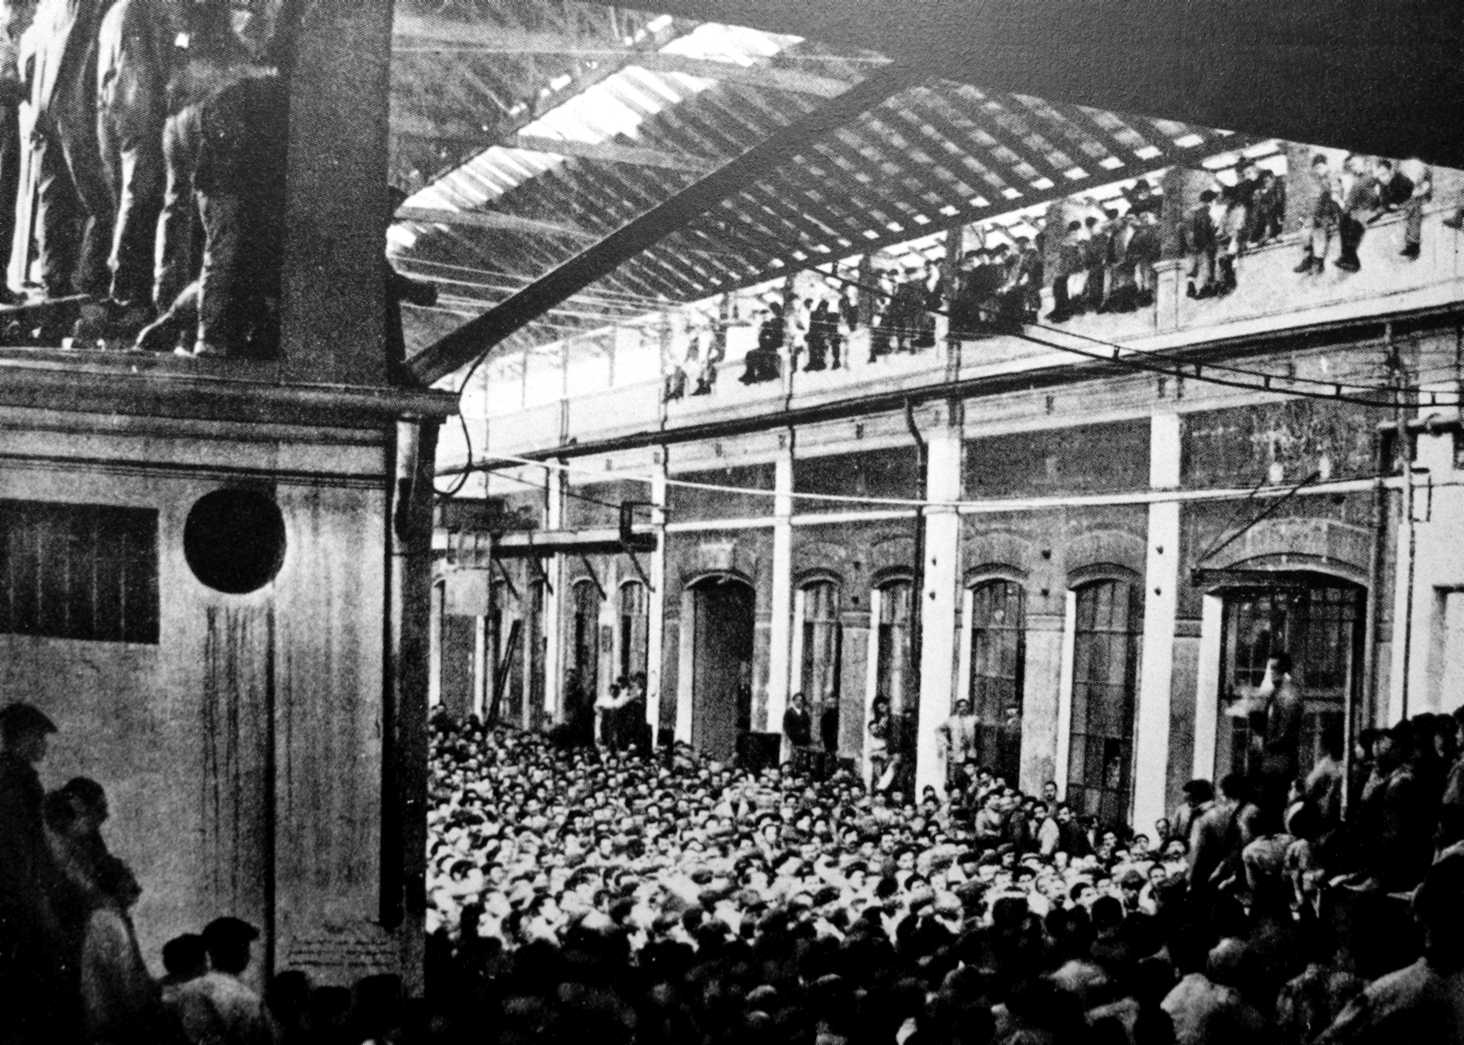 Assemblea a la fàbrica Fiat (Torí, 1920)